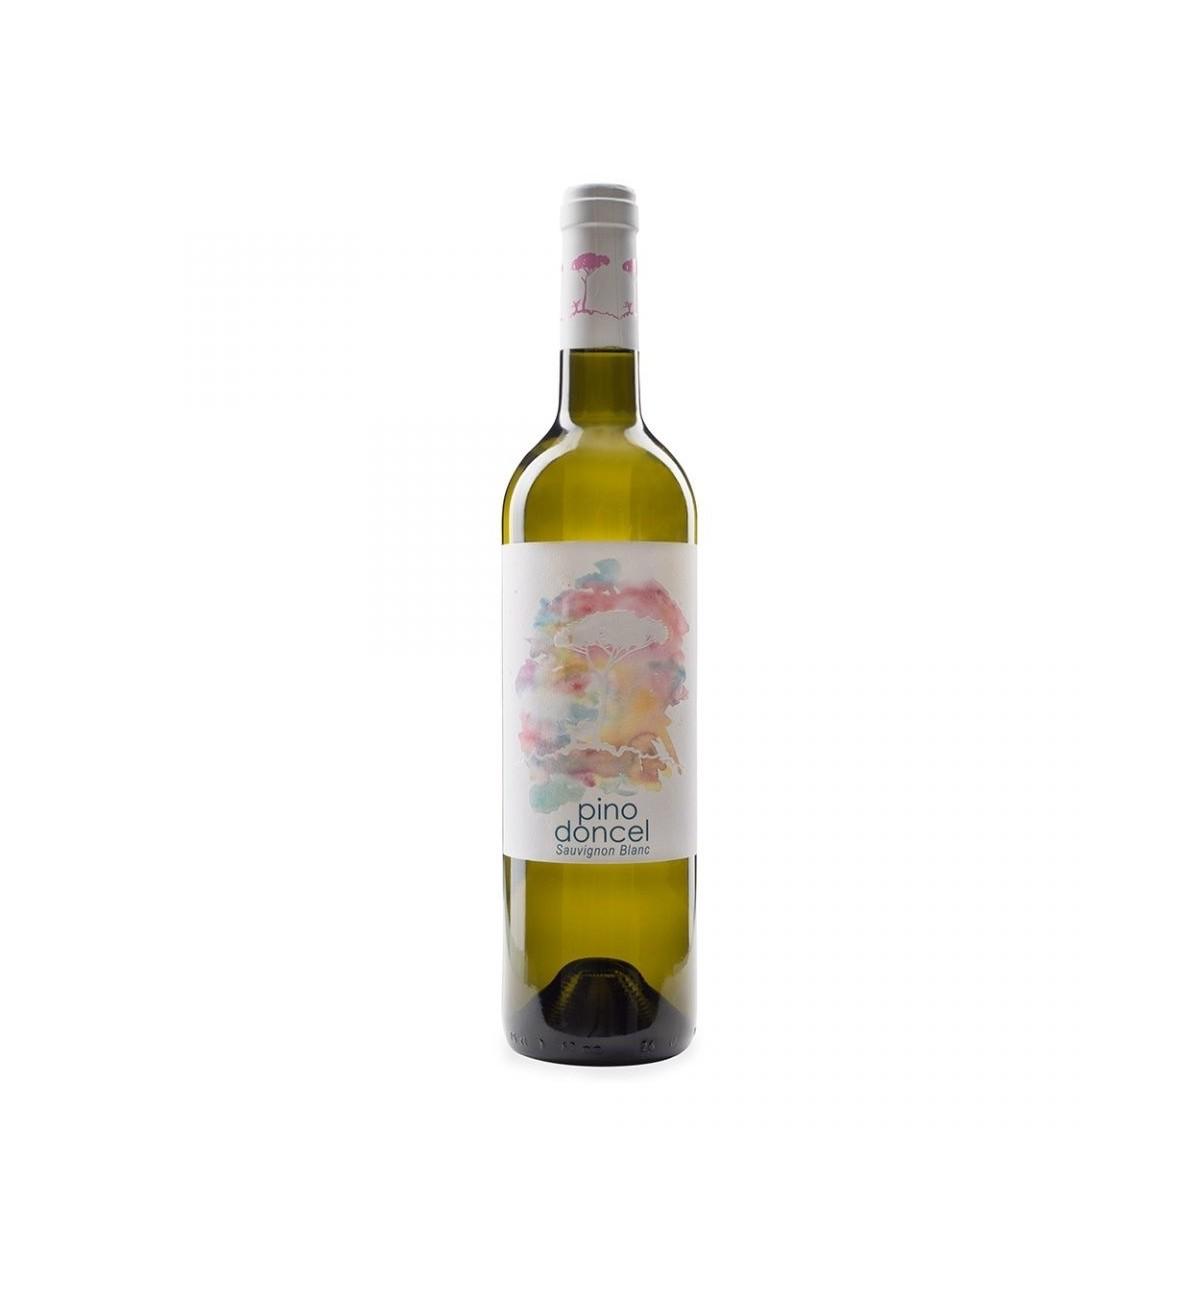 Pino Doncel Blanco - Sauvignon blanc, Jumilla